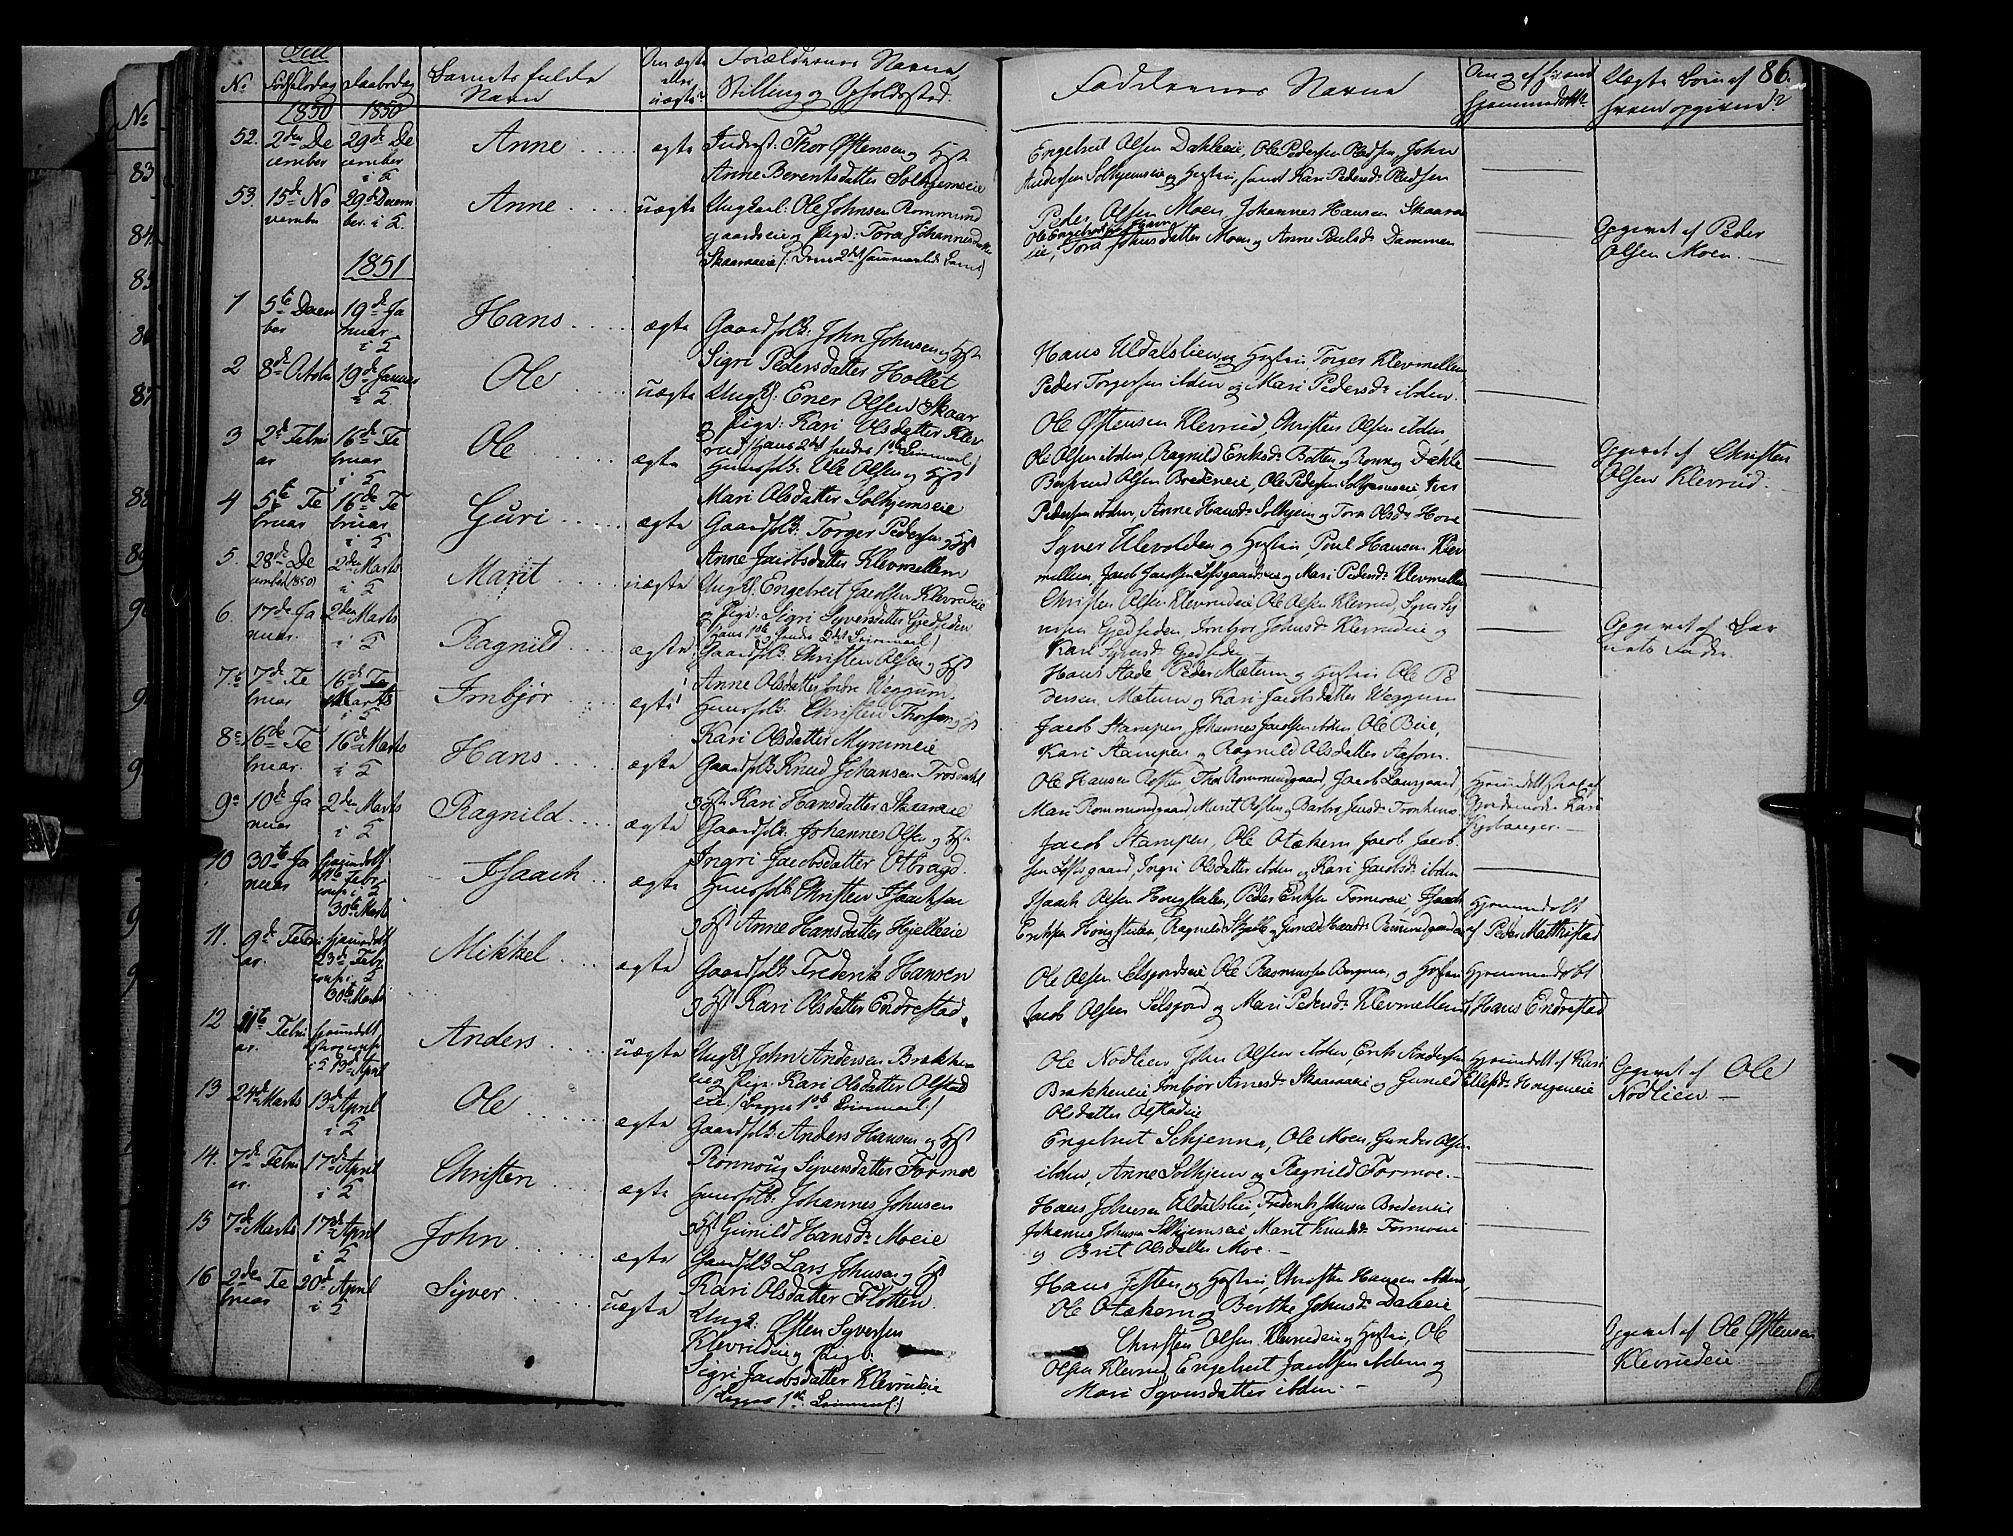 SAH, Vågå prestekontor, Ministerialbok nr. 5 /3, 1842-1856, s. 86